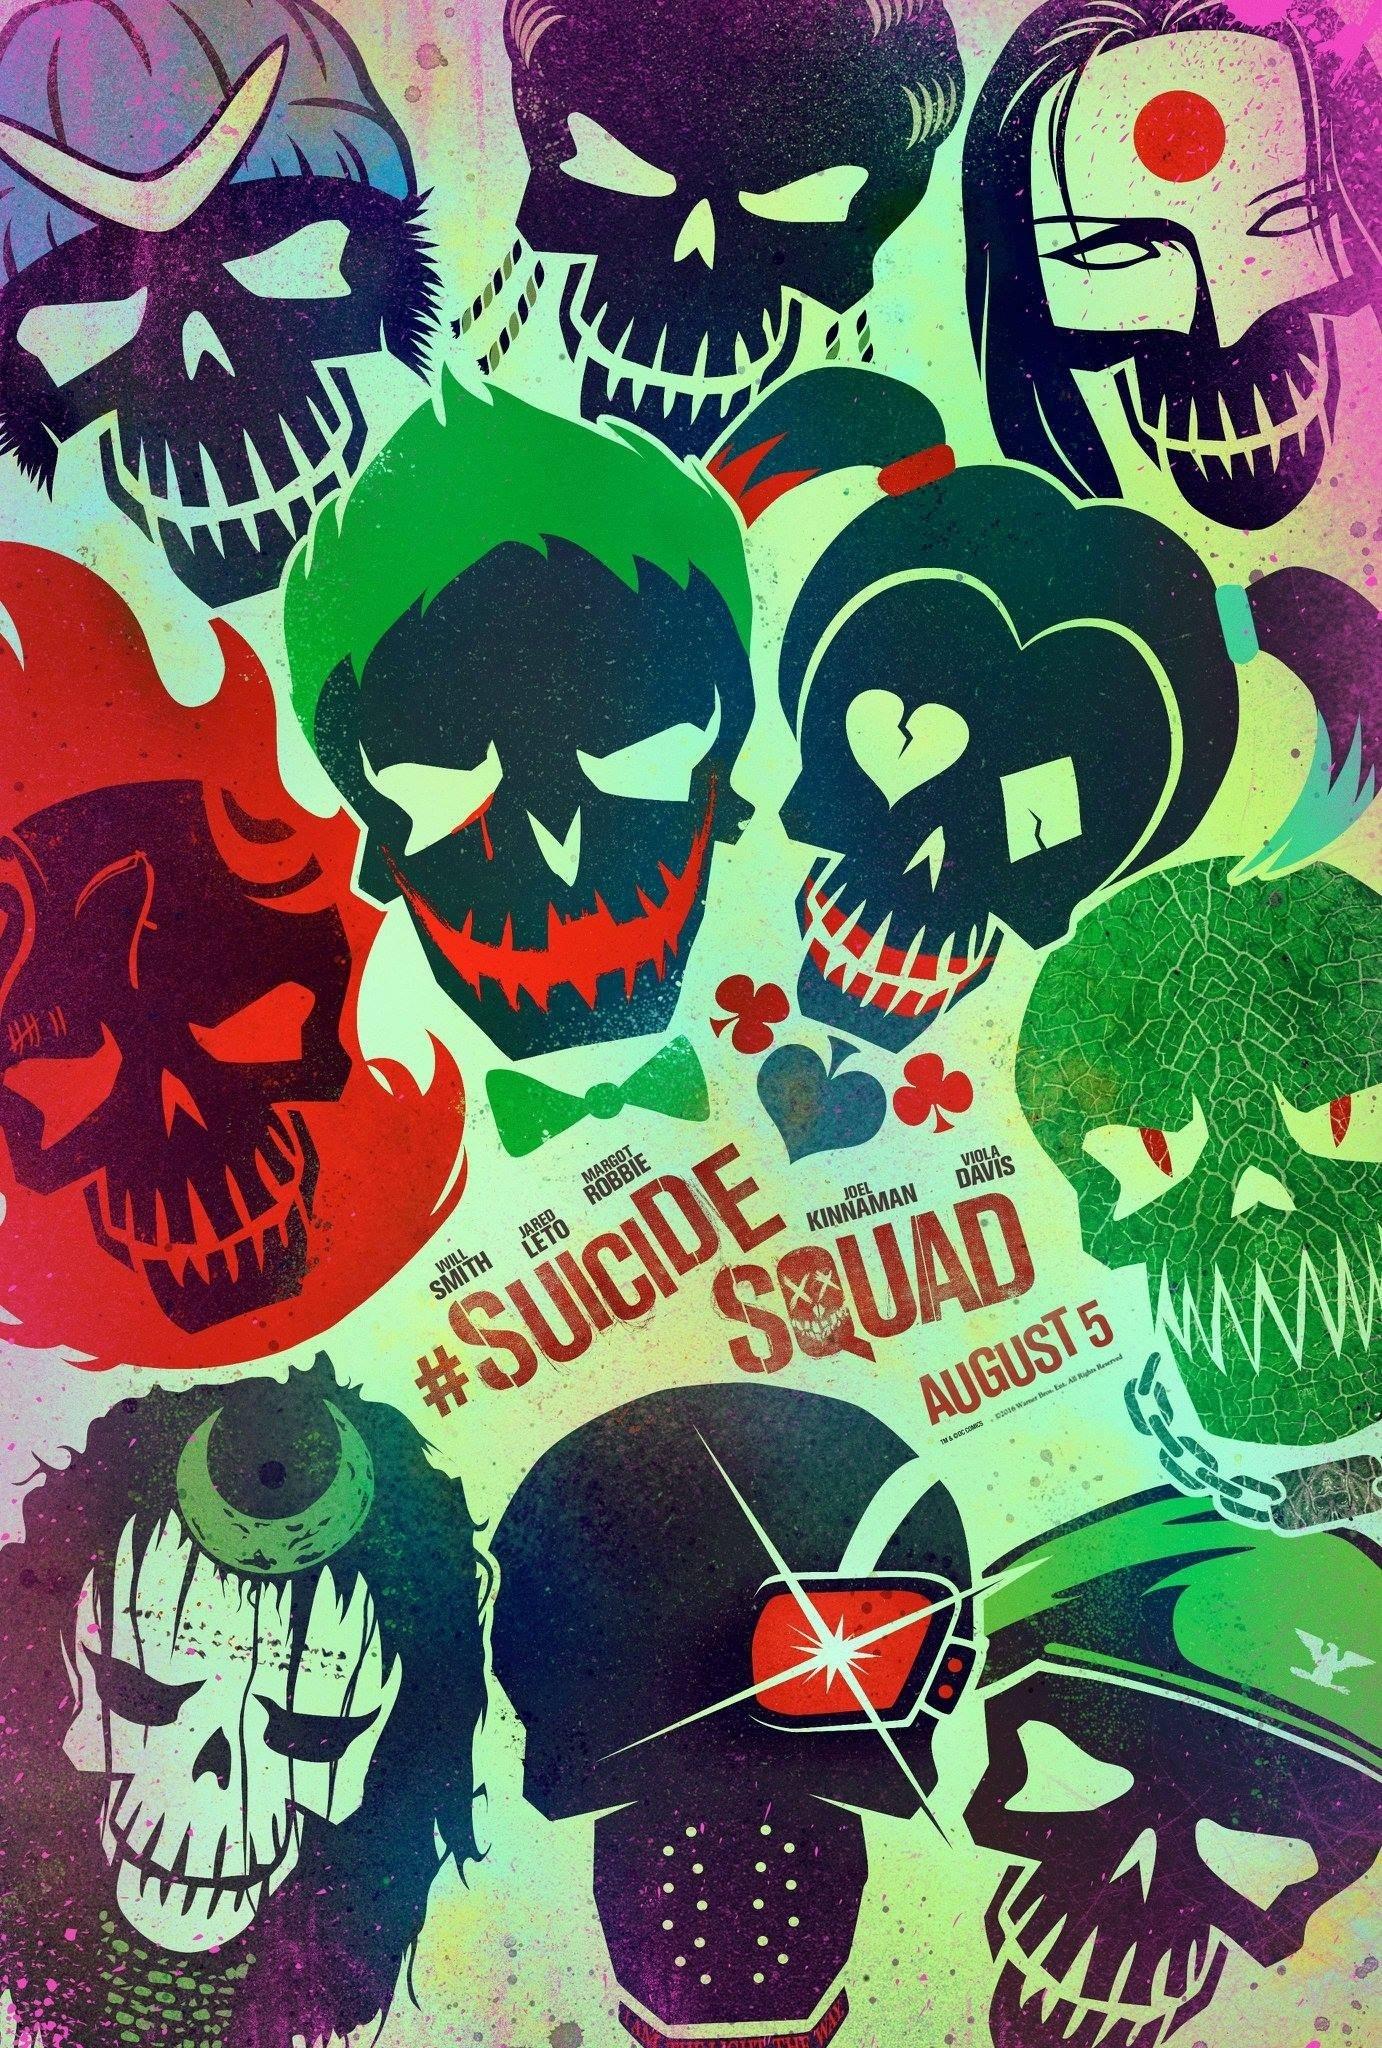 Joker Suicide Squad Wallpapers – Wallpaper Cave